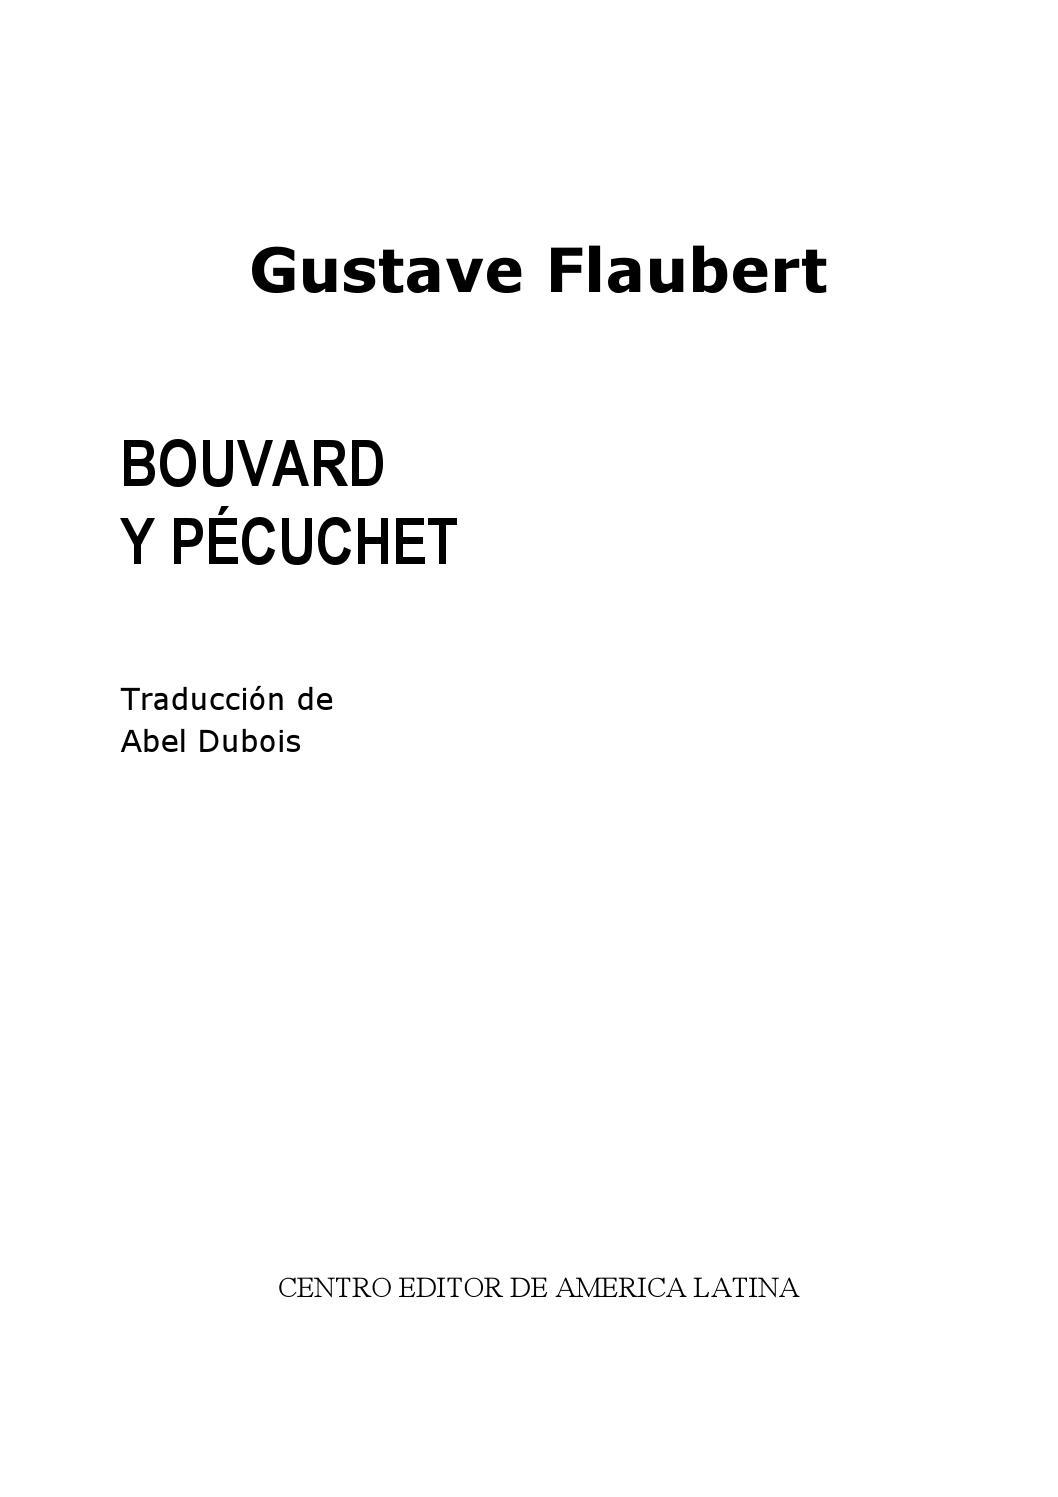 Flaubert bouvard pcuchet by Reditus Aeternam - issuu